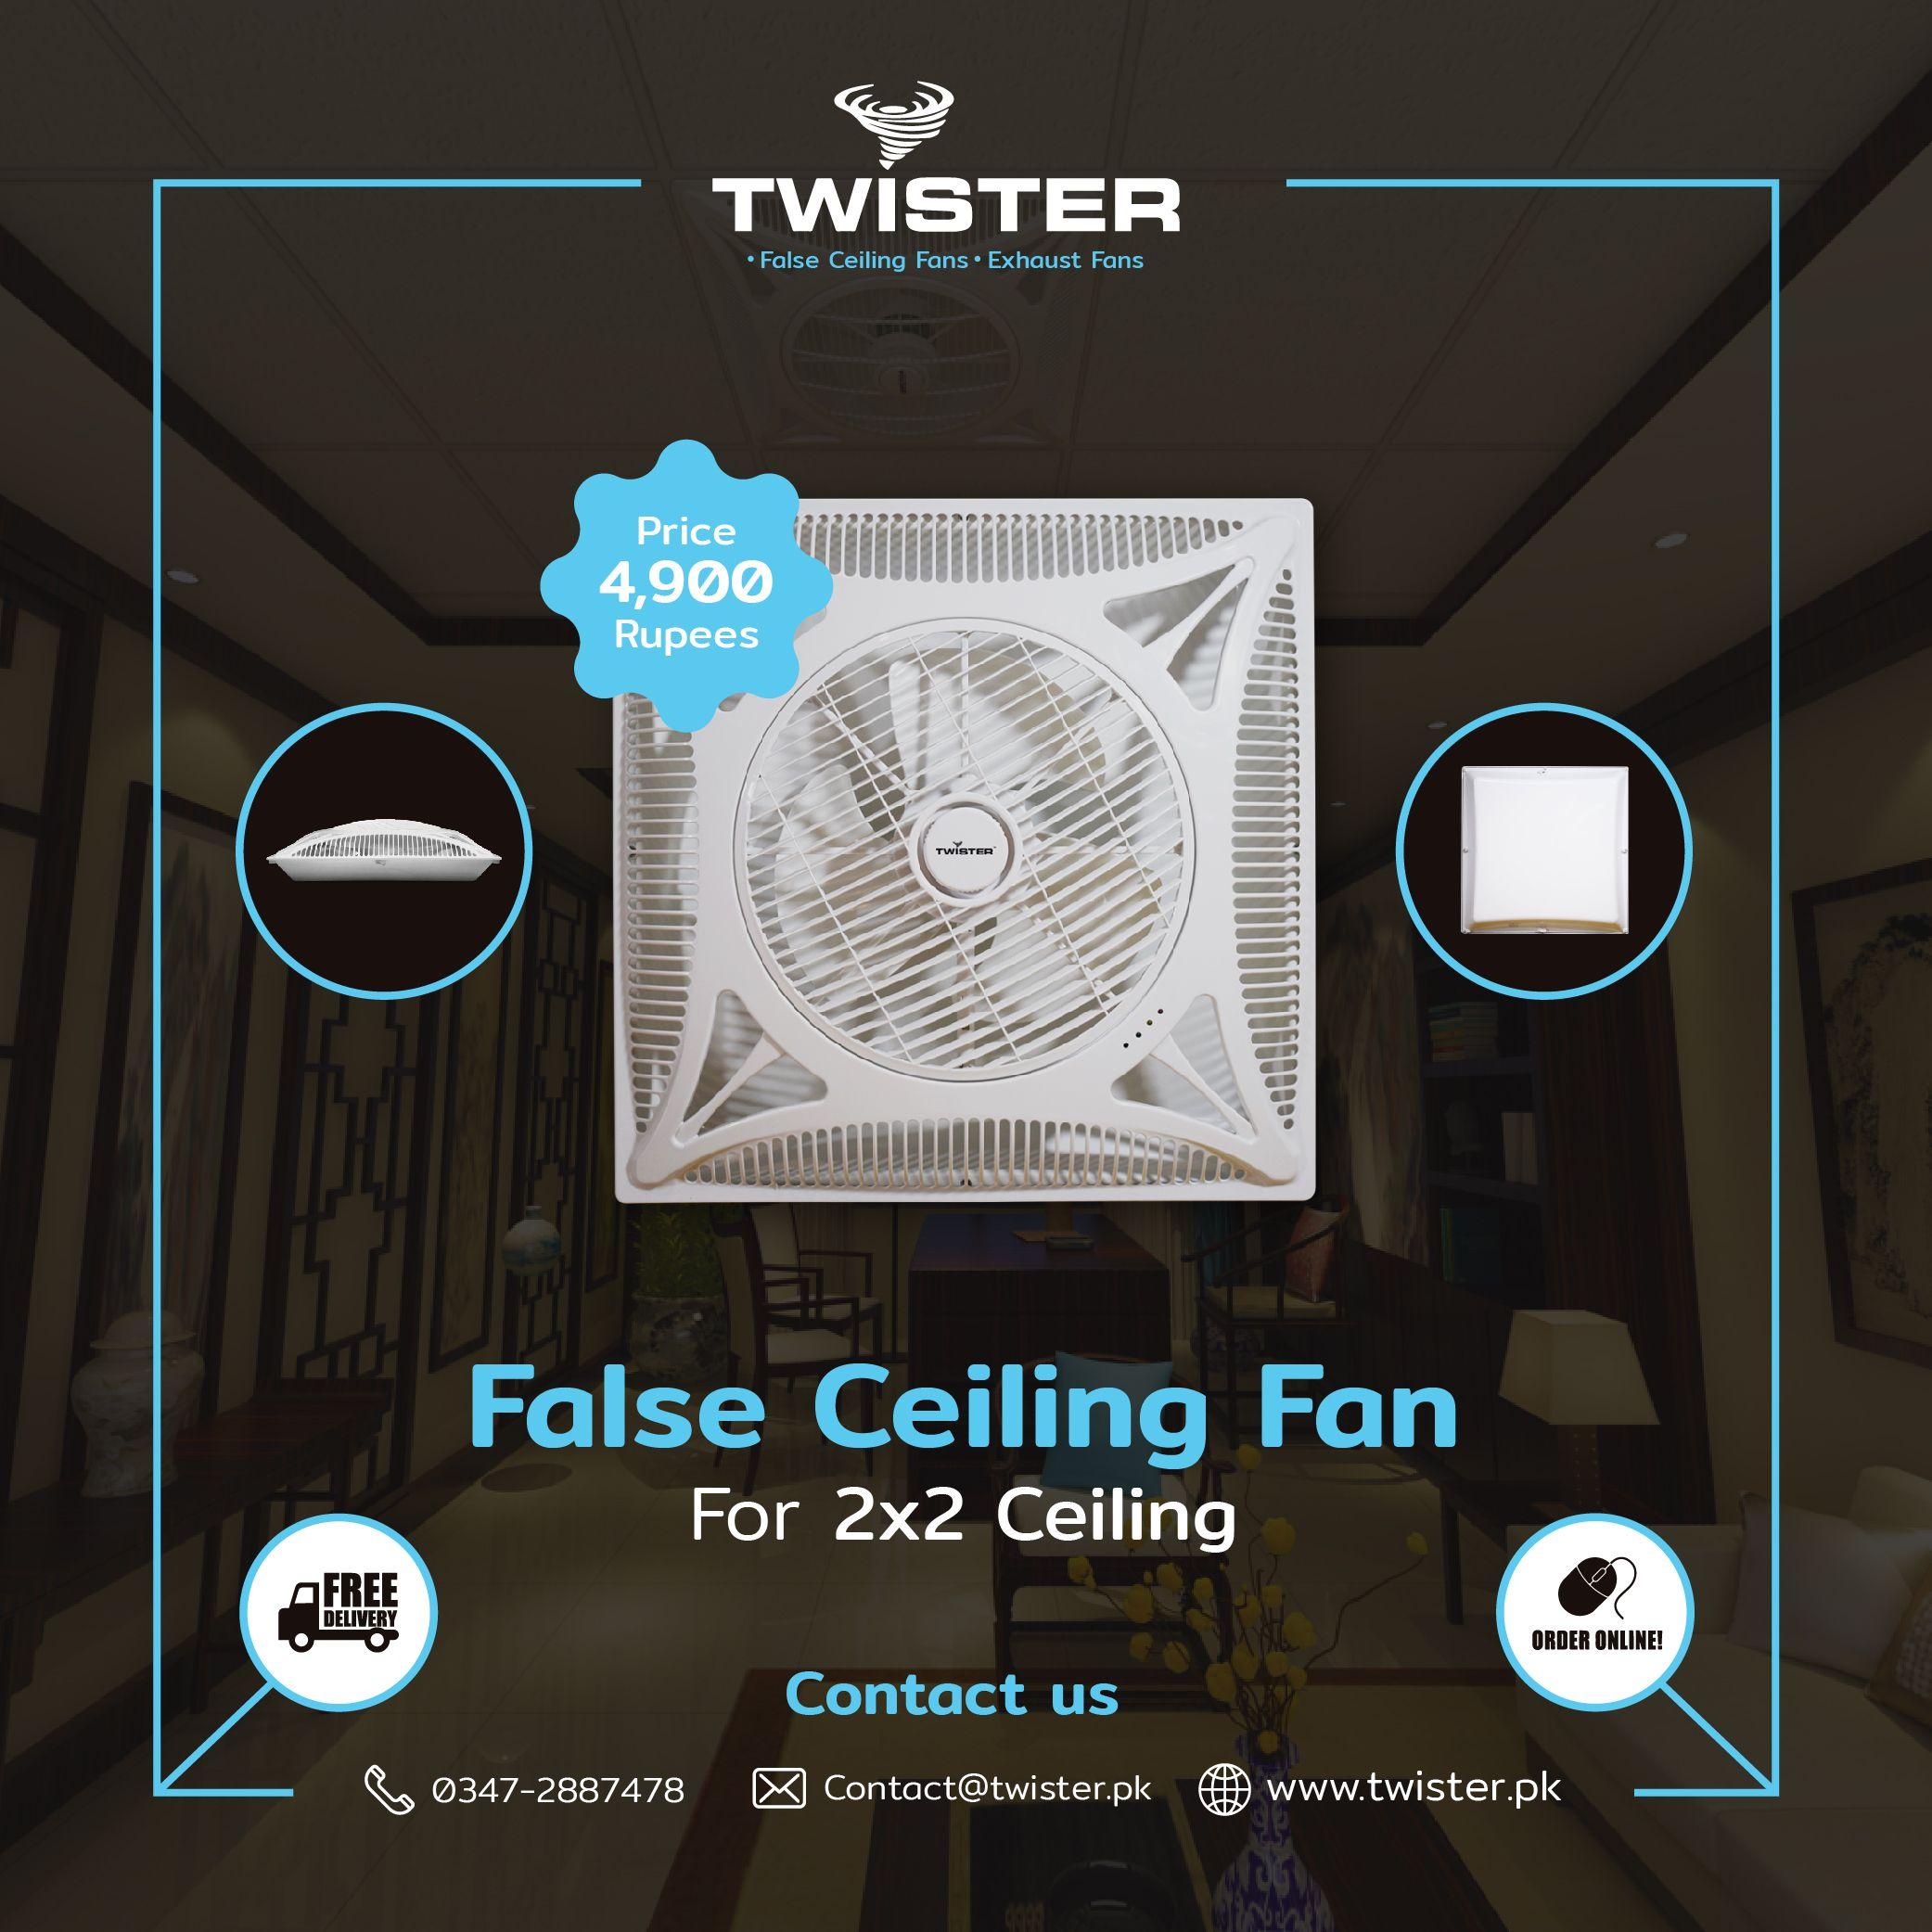 Twister Super Slim False Ceiling Fan 14 Price 4 900 Free